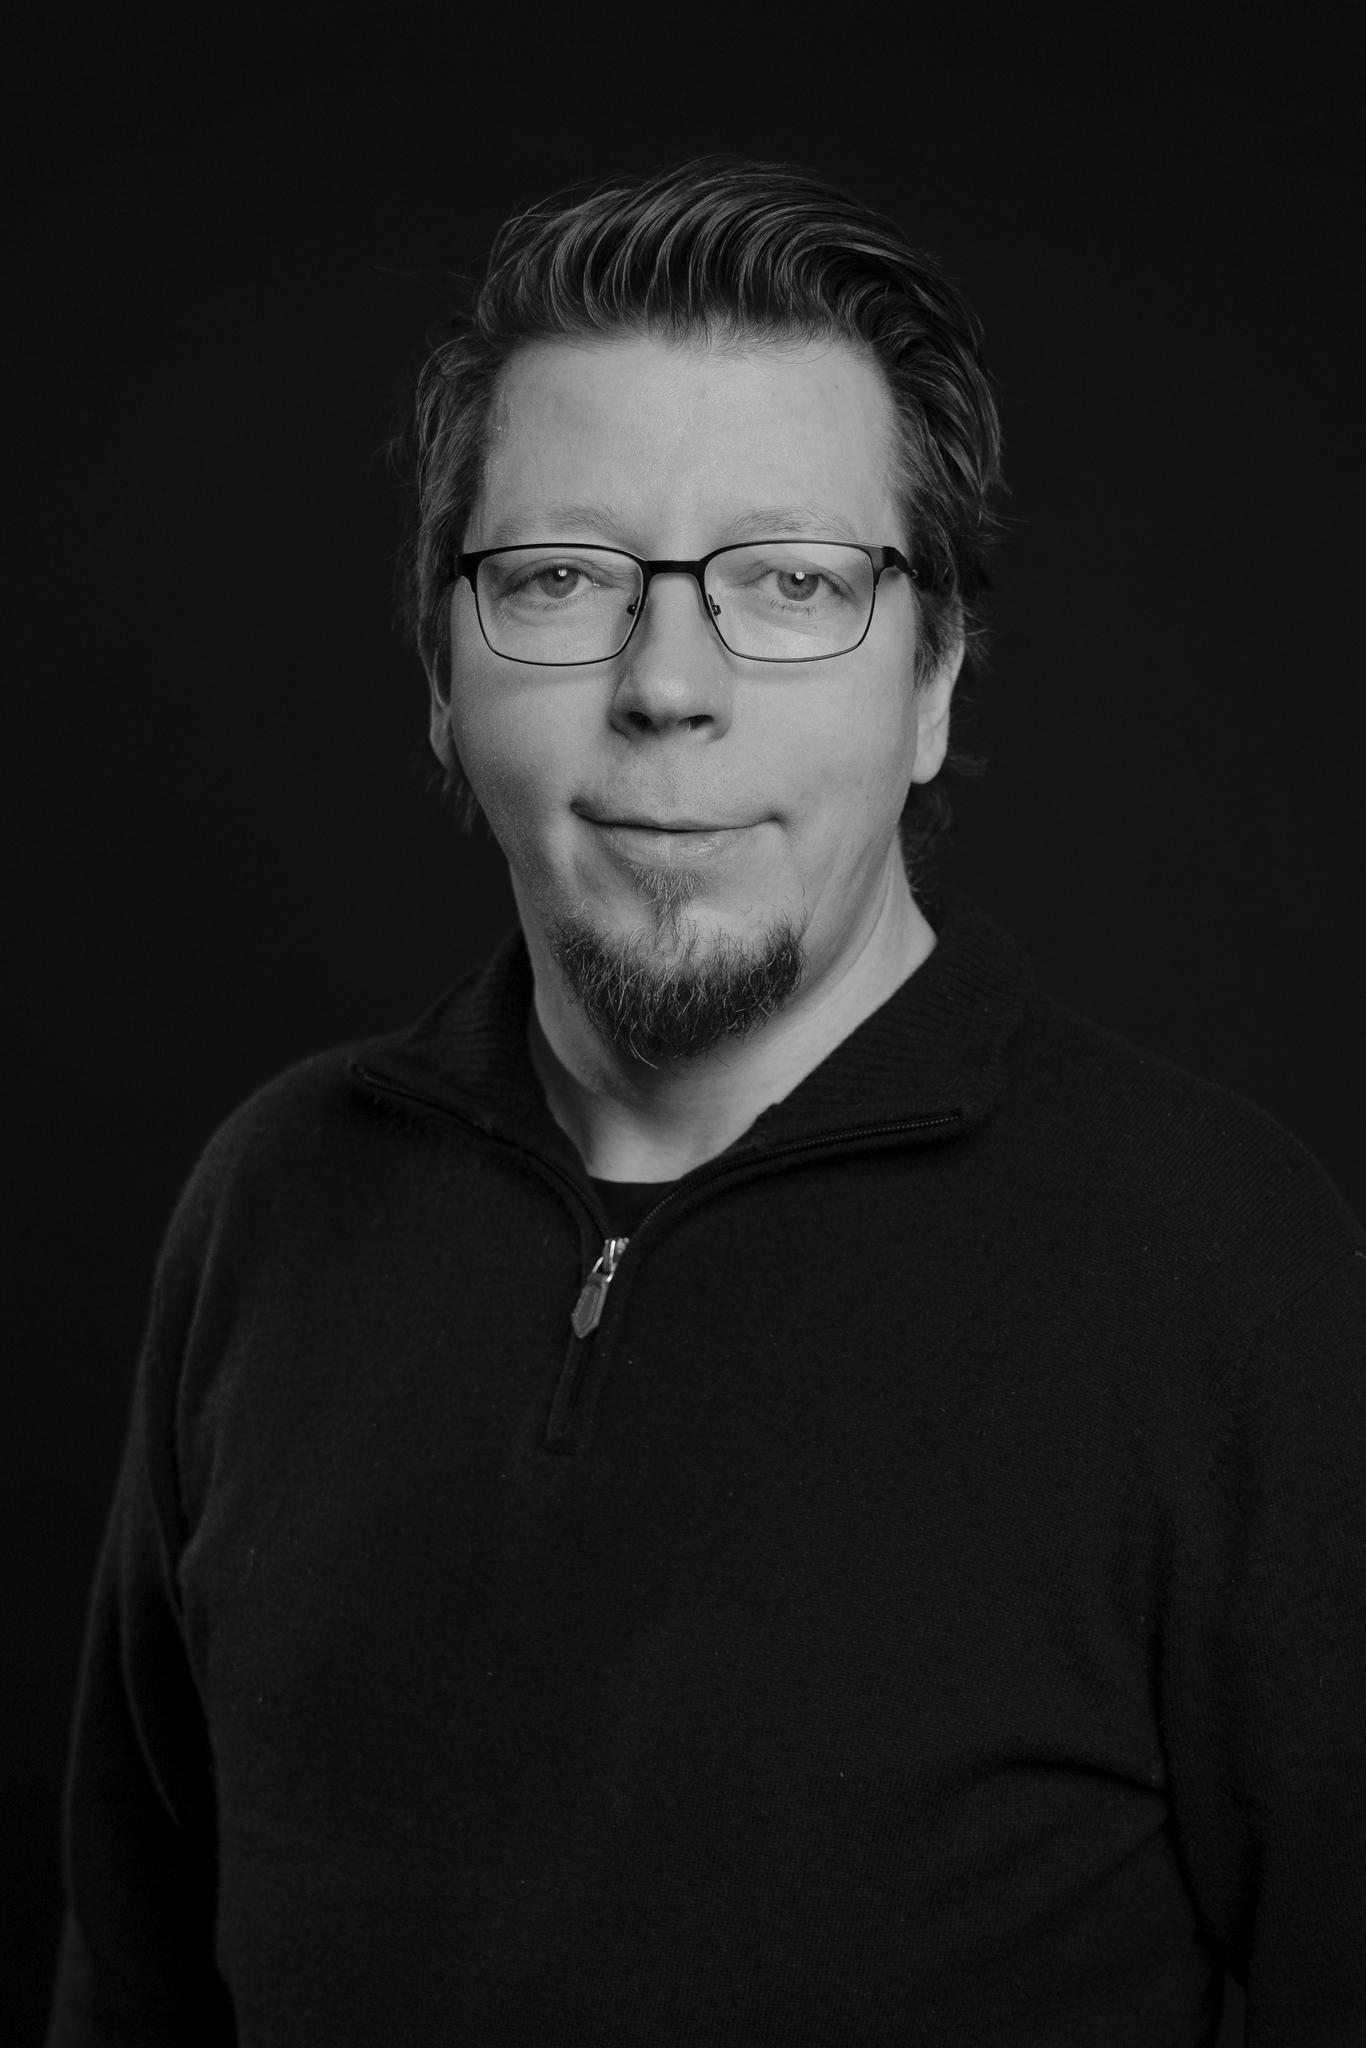 Jan Henrik Ohme image 1